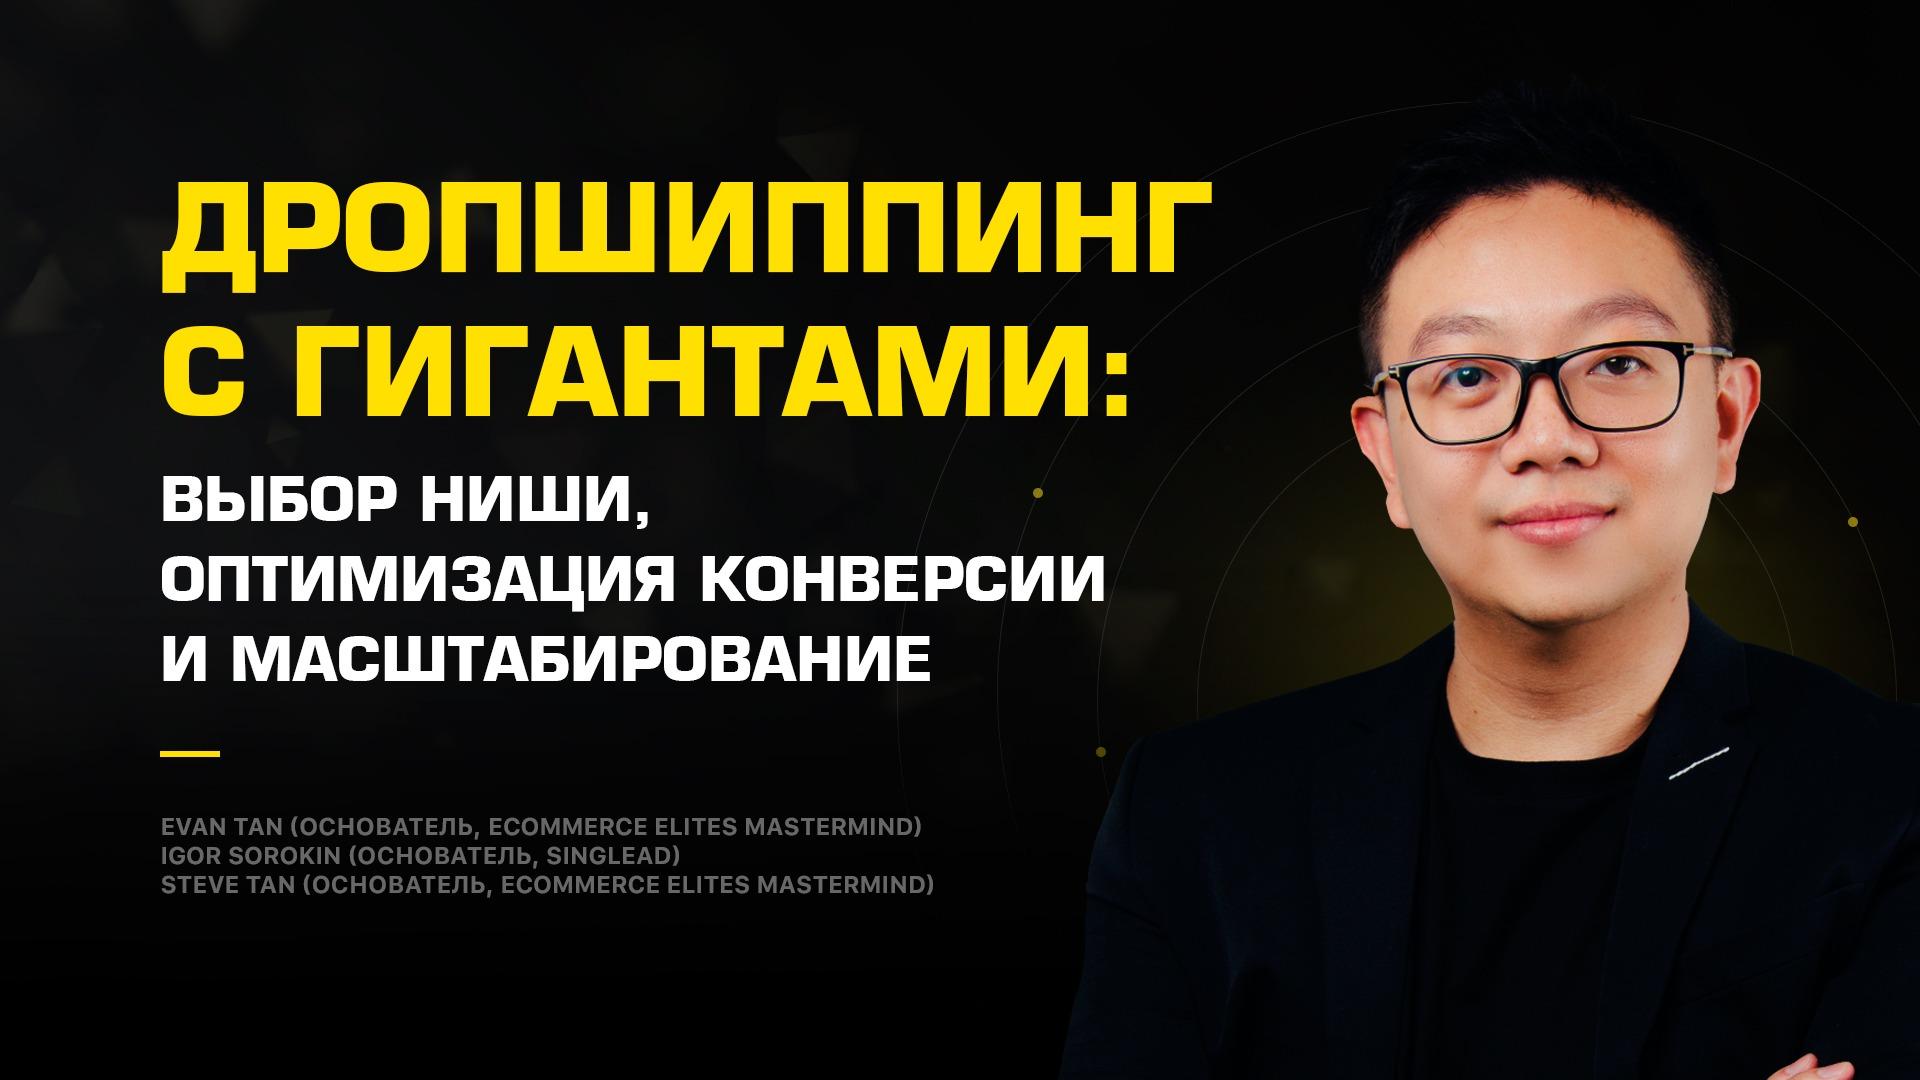 Дропшиппинг с гигантами: выбор ниши, оптимизация конверсии и масштабирование https://blackmedia.pro/2020/11/13/dropshipping-s-gigantami-vybor-nishi-optimizacziya-konversii-i-masshtabirovanie/